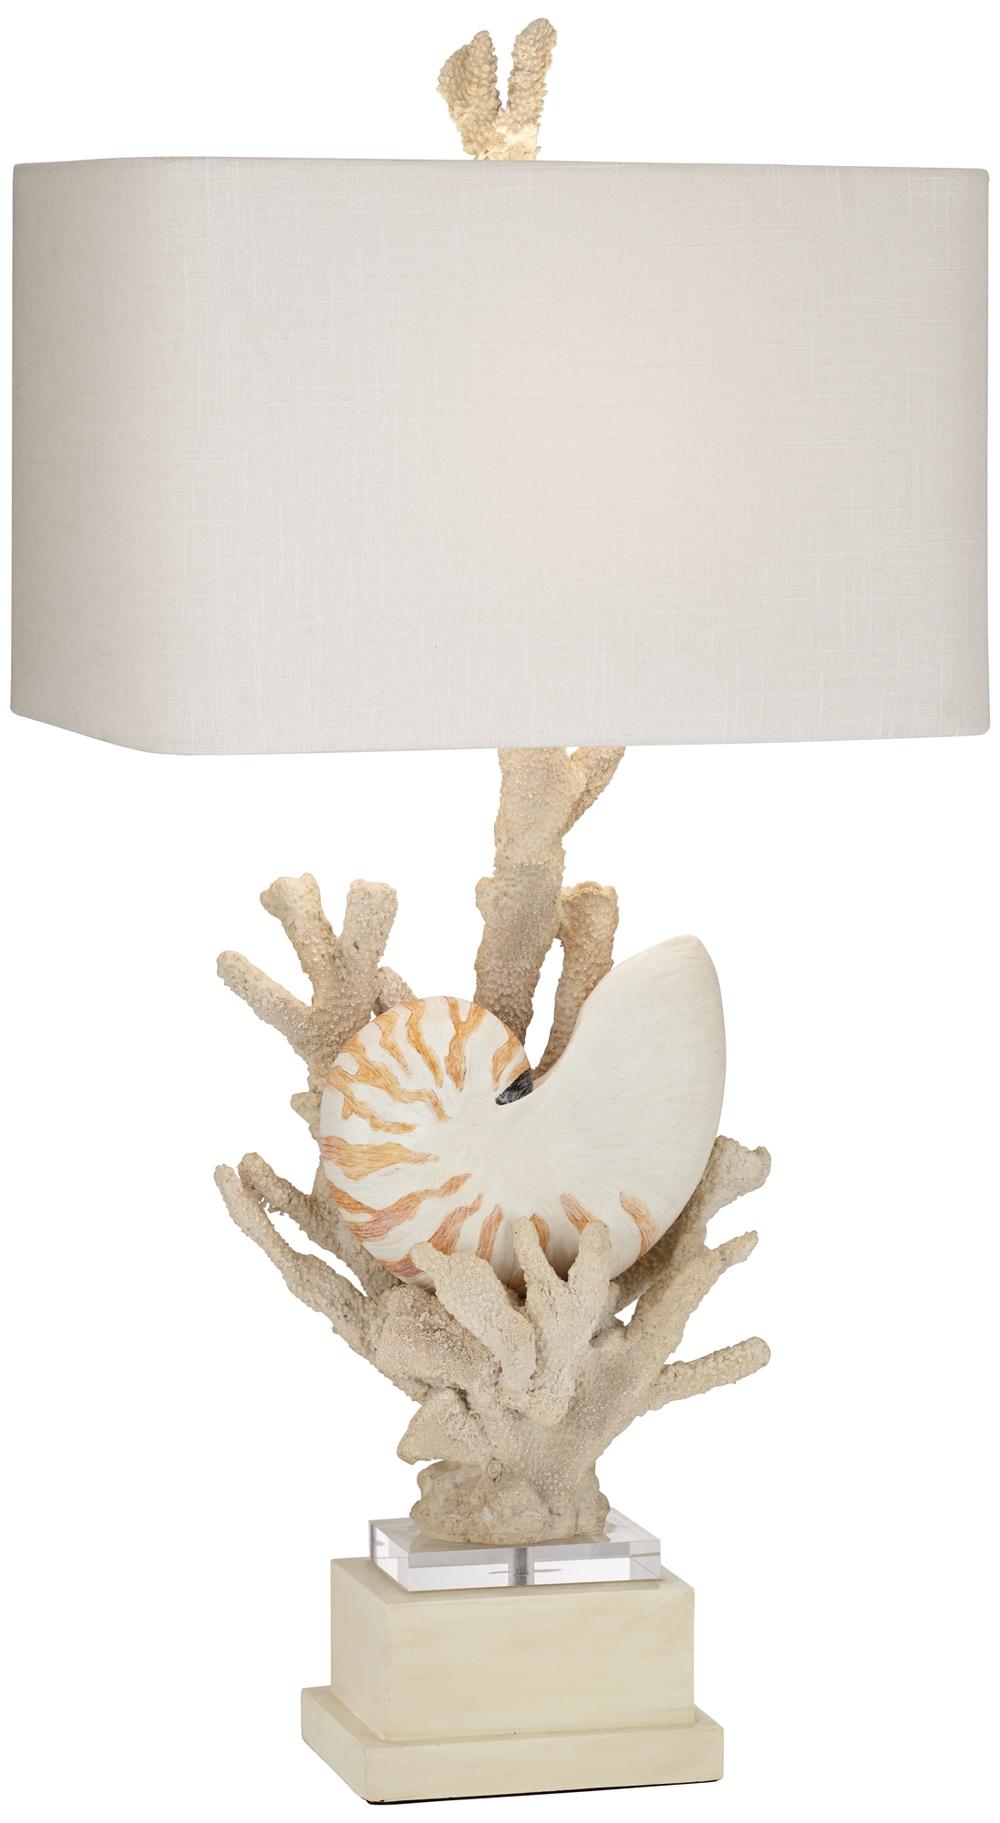 Pacific Coast Lighting - Hanauma Bay Table Lamp